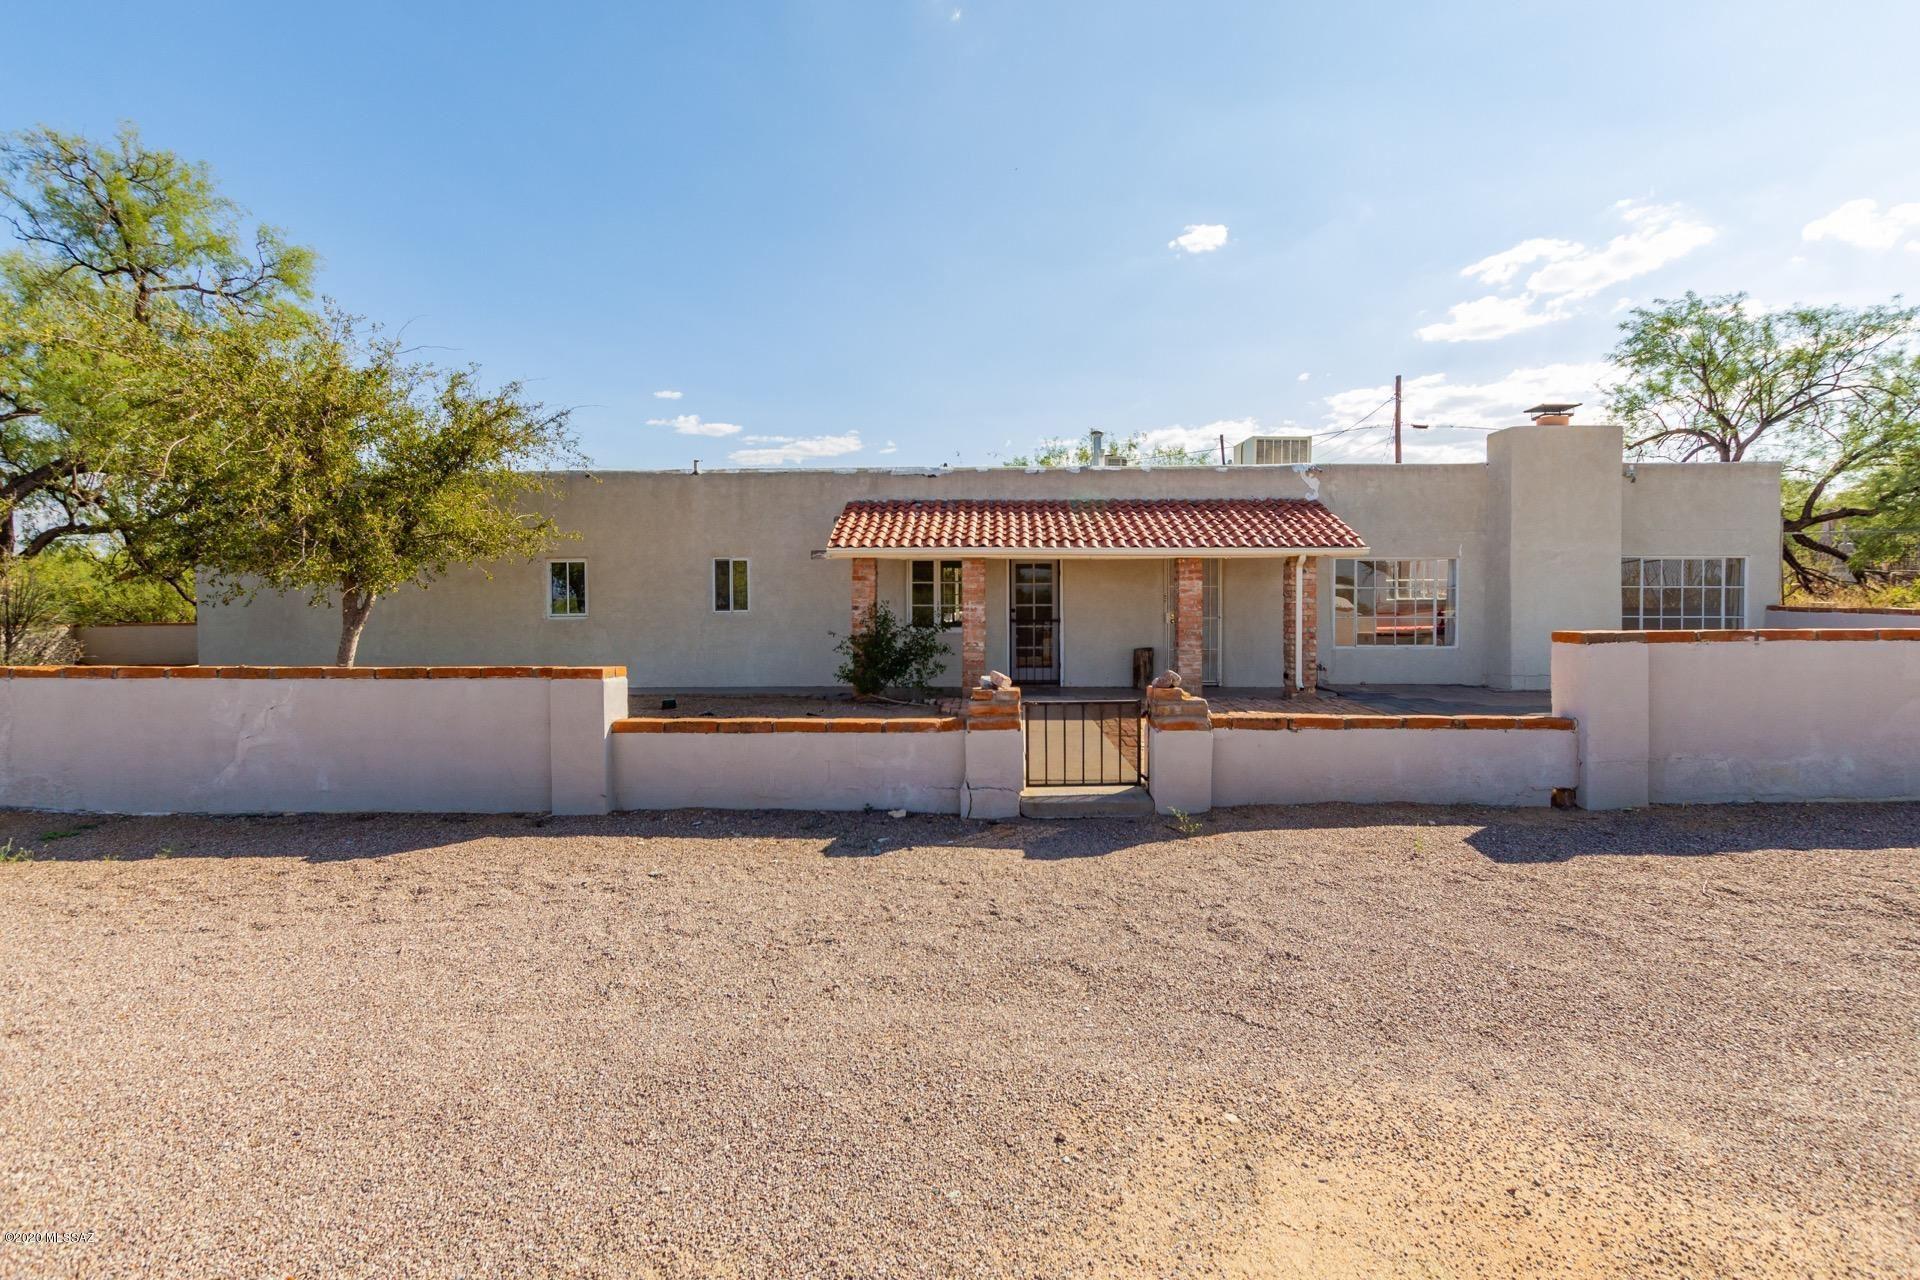 458 E 7Th Street, Benson, AZ 85602 - MLS#: 22024852